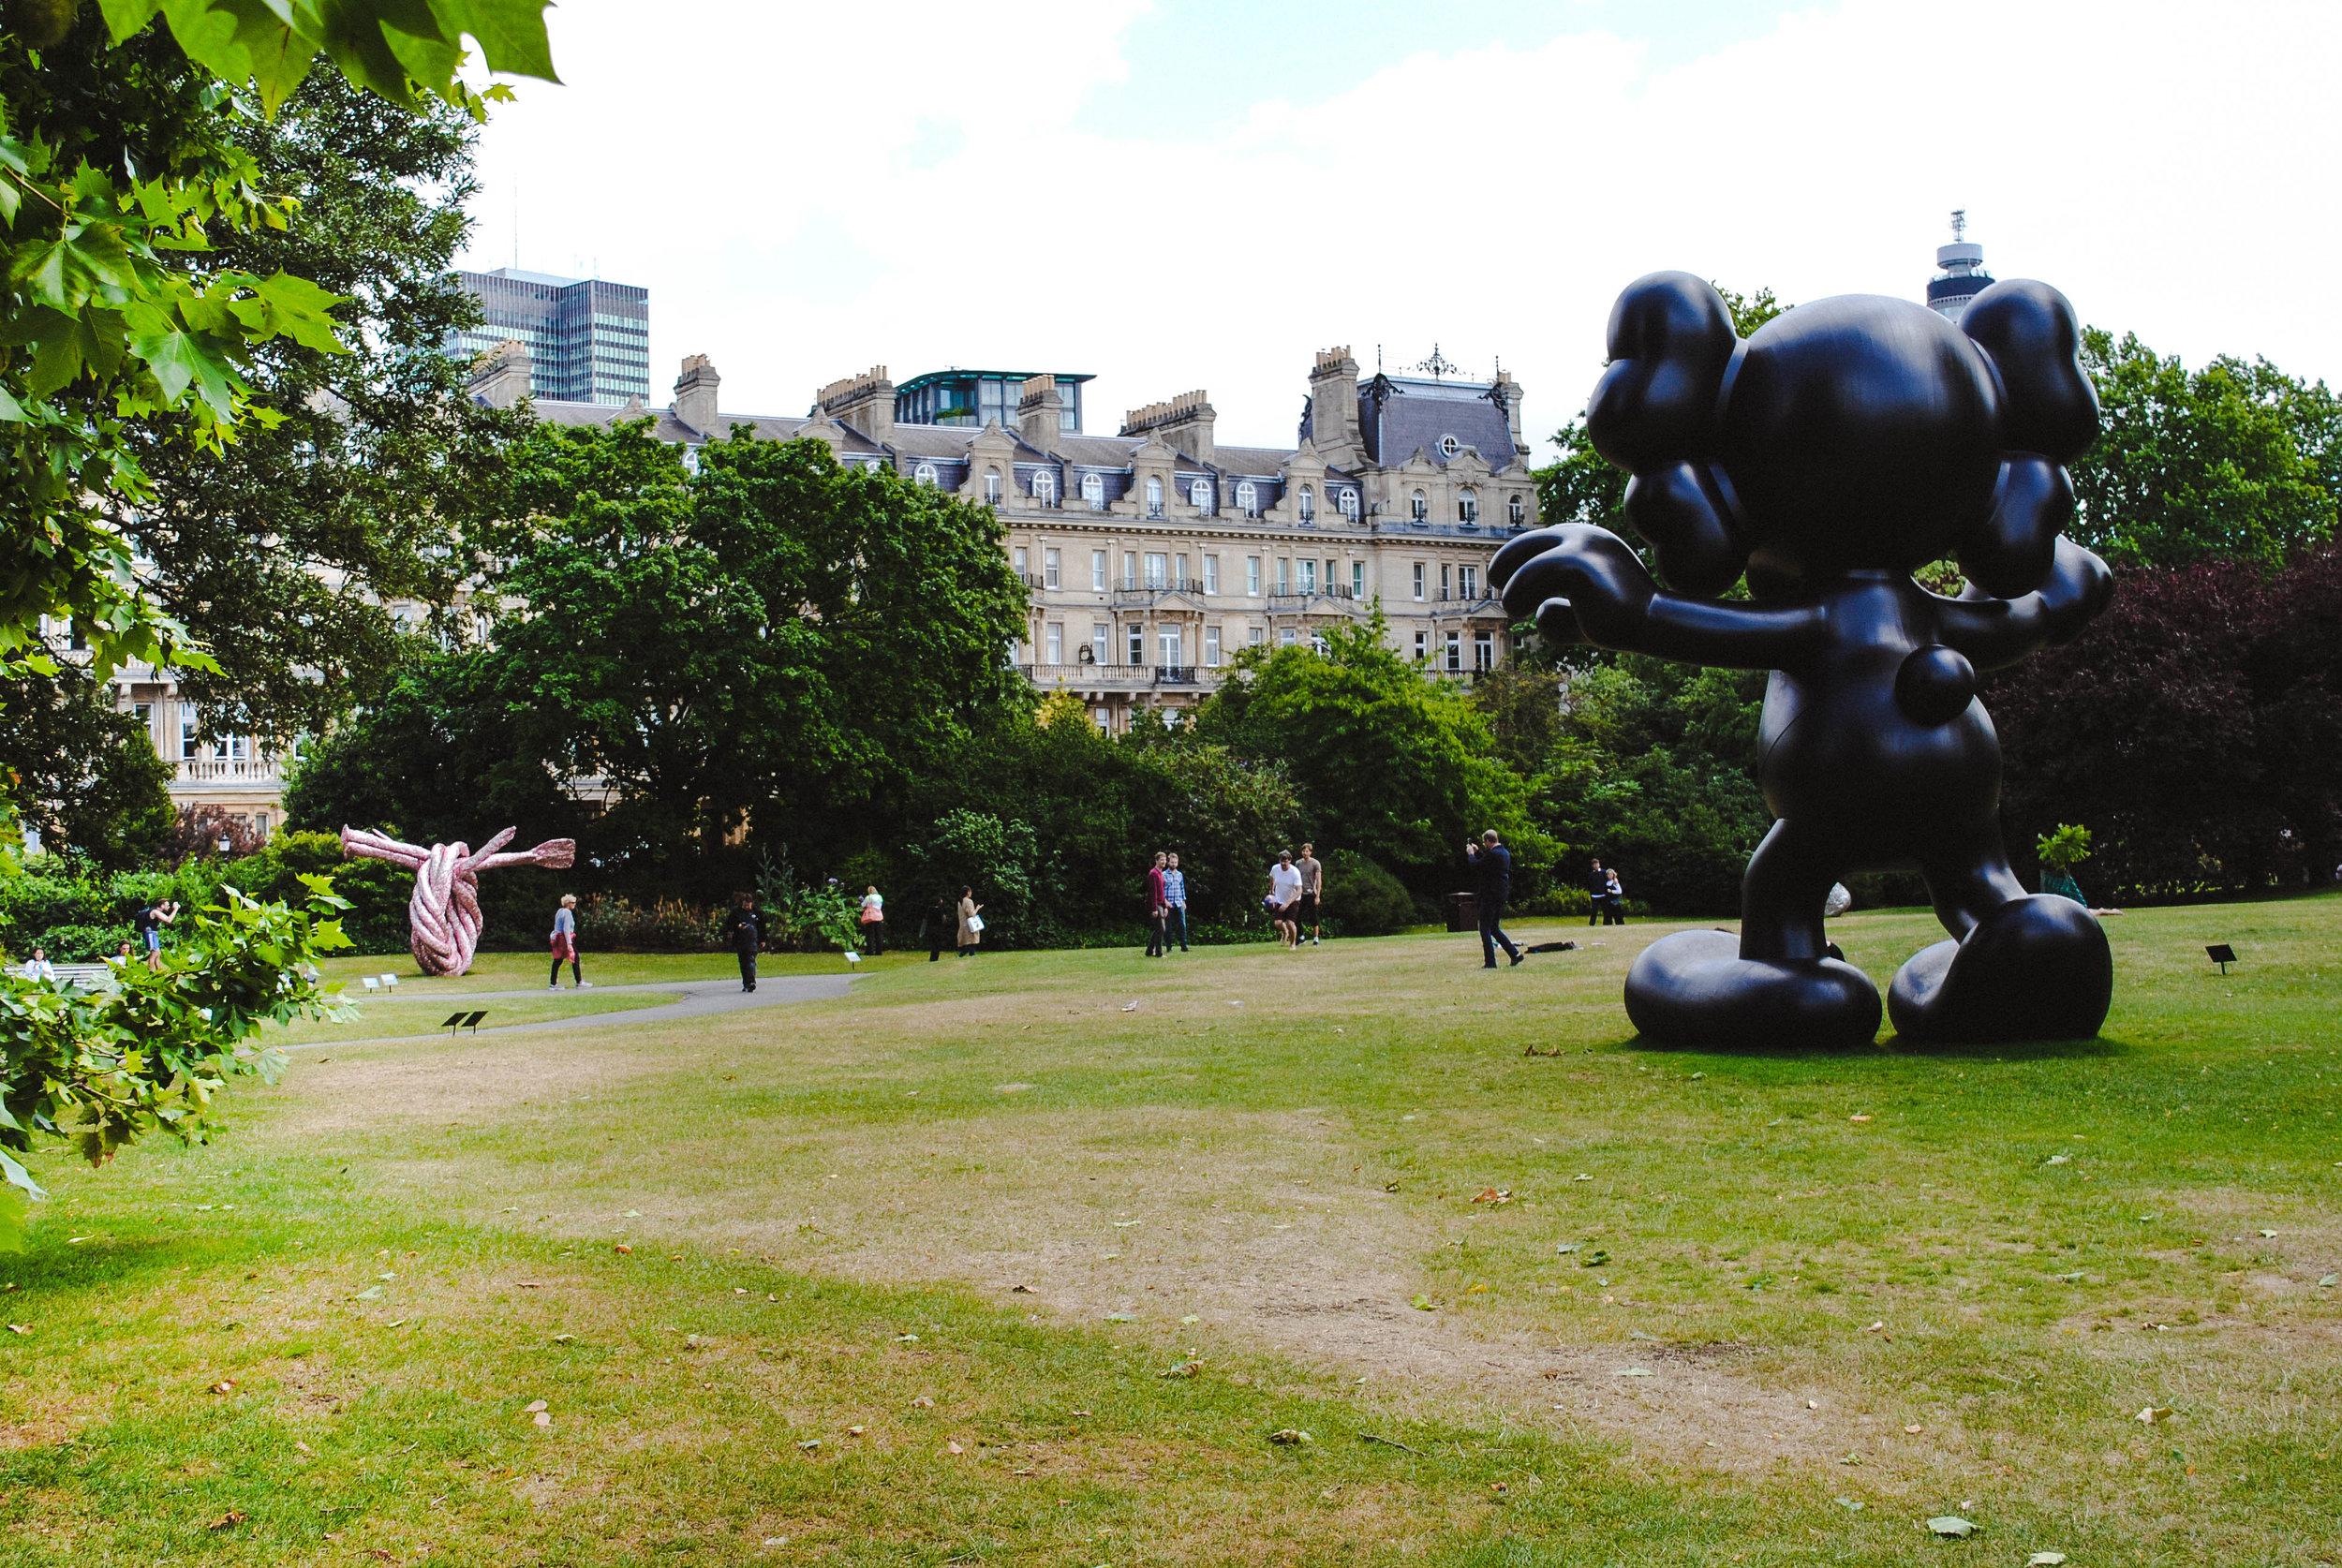 frieze sculpture regents park (12 of 15).jpg